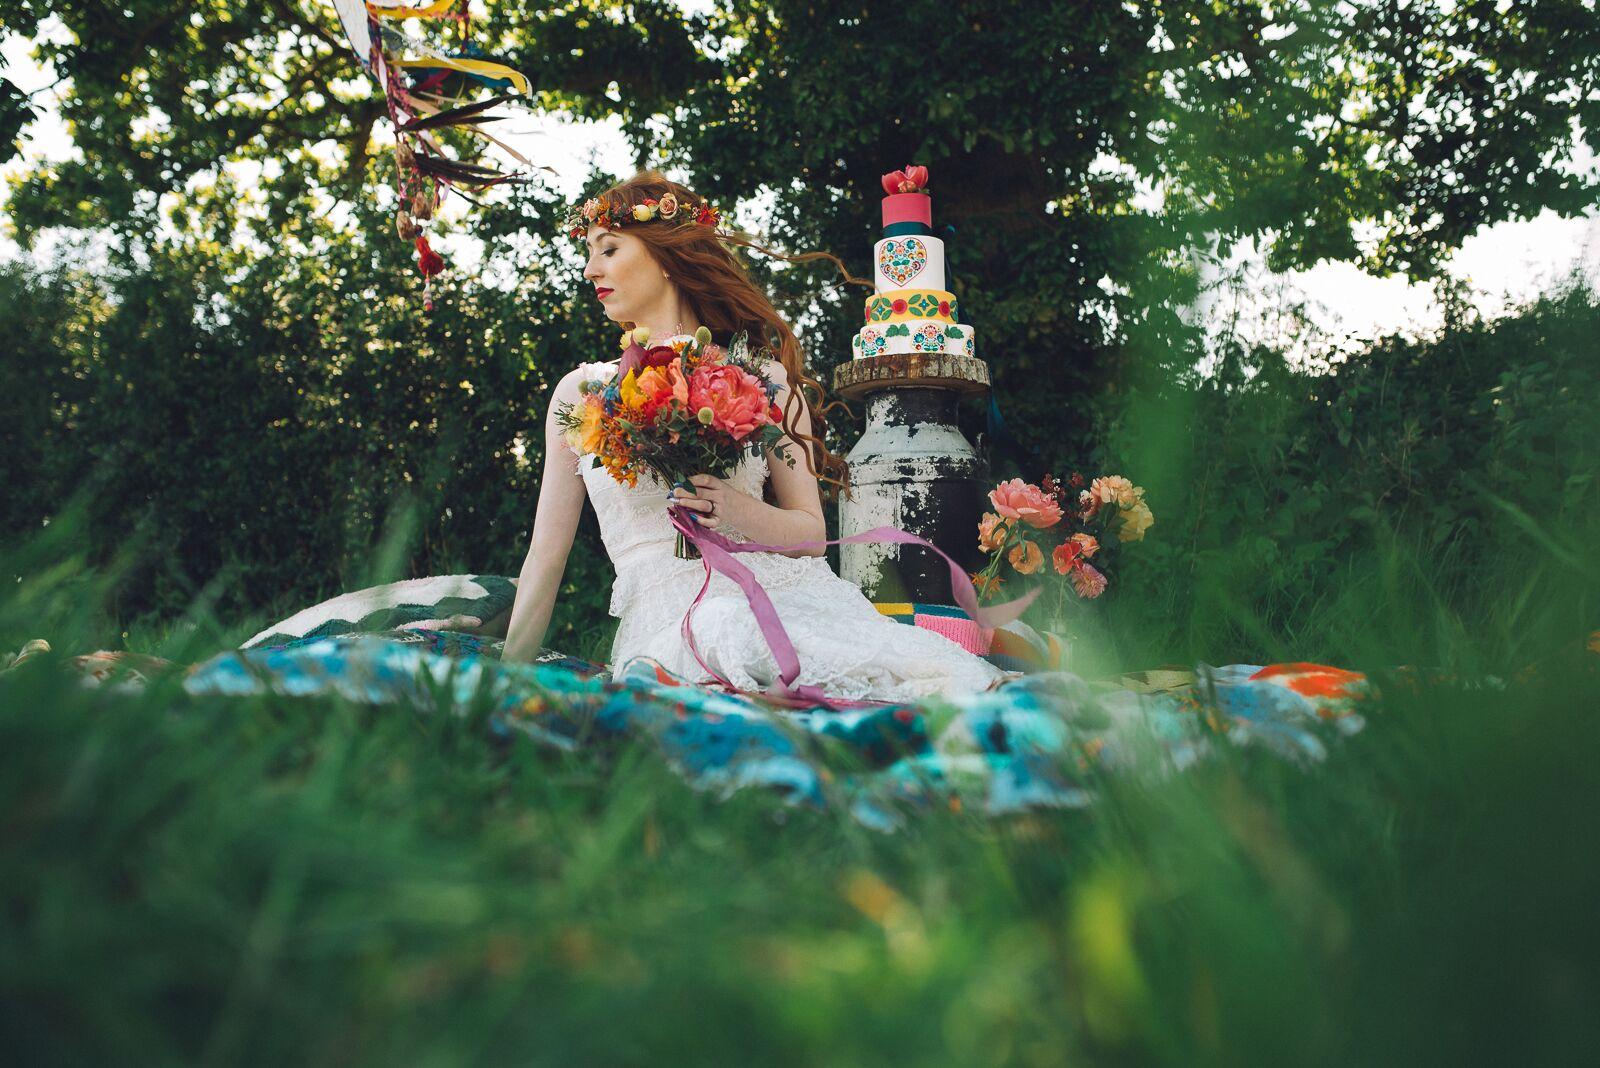 Pea-Green Boat events company - alternative wedding planner - unconventional wedding - boho wedding - colourful wedding